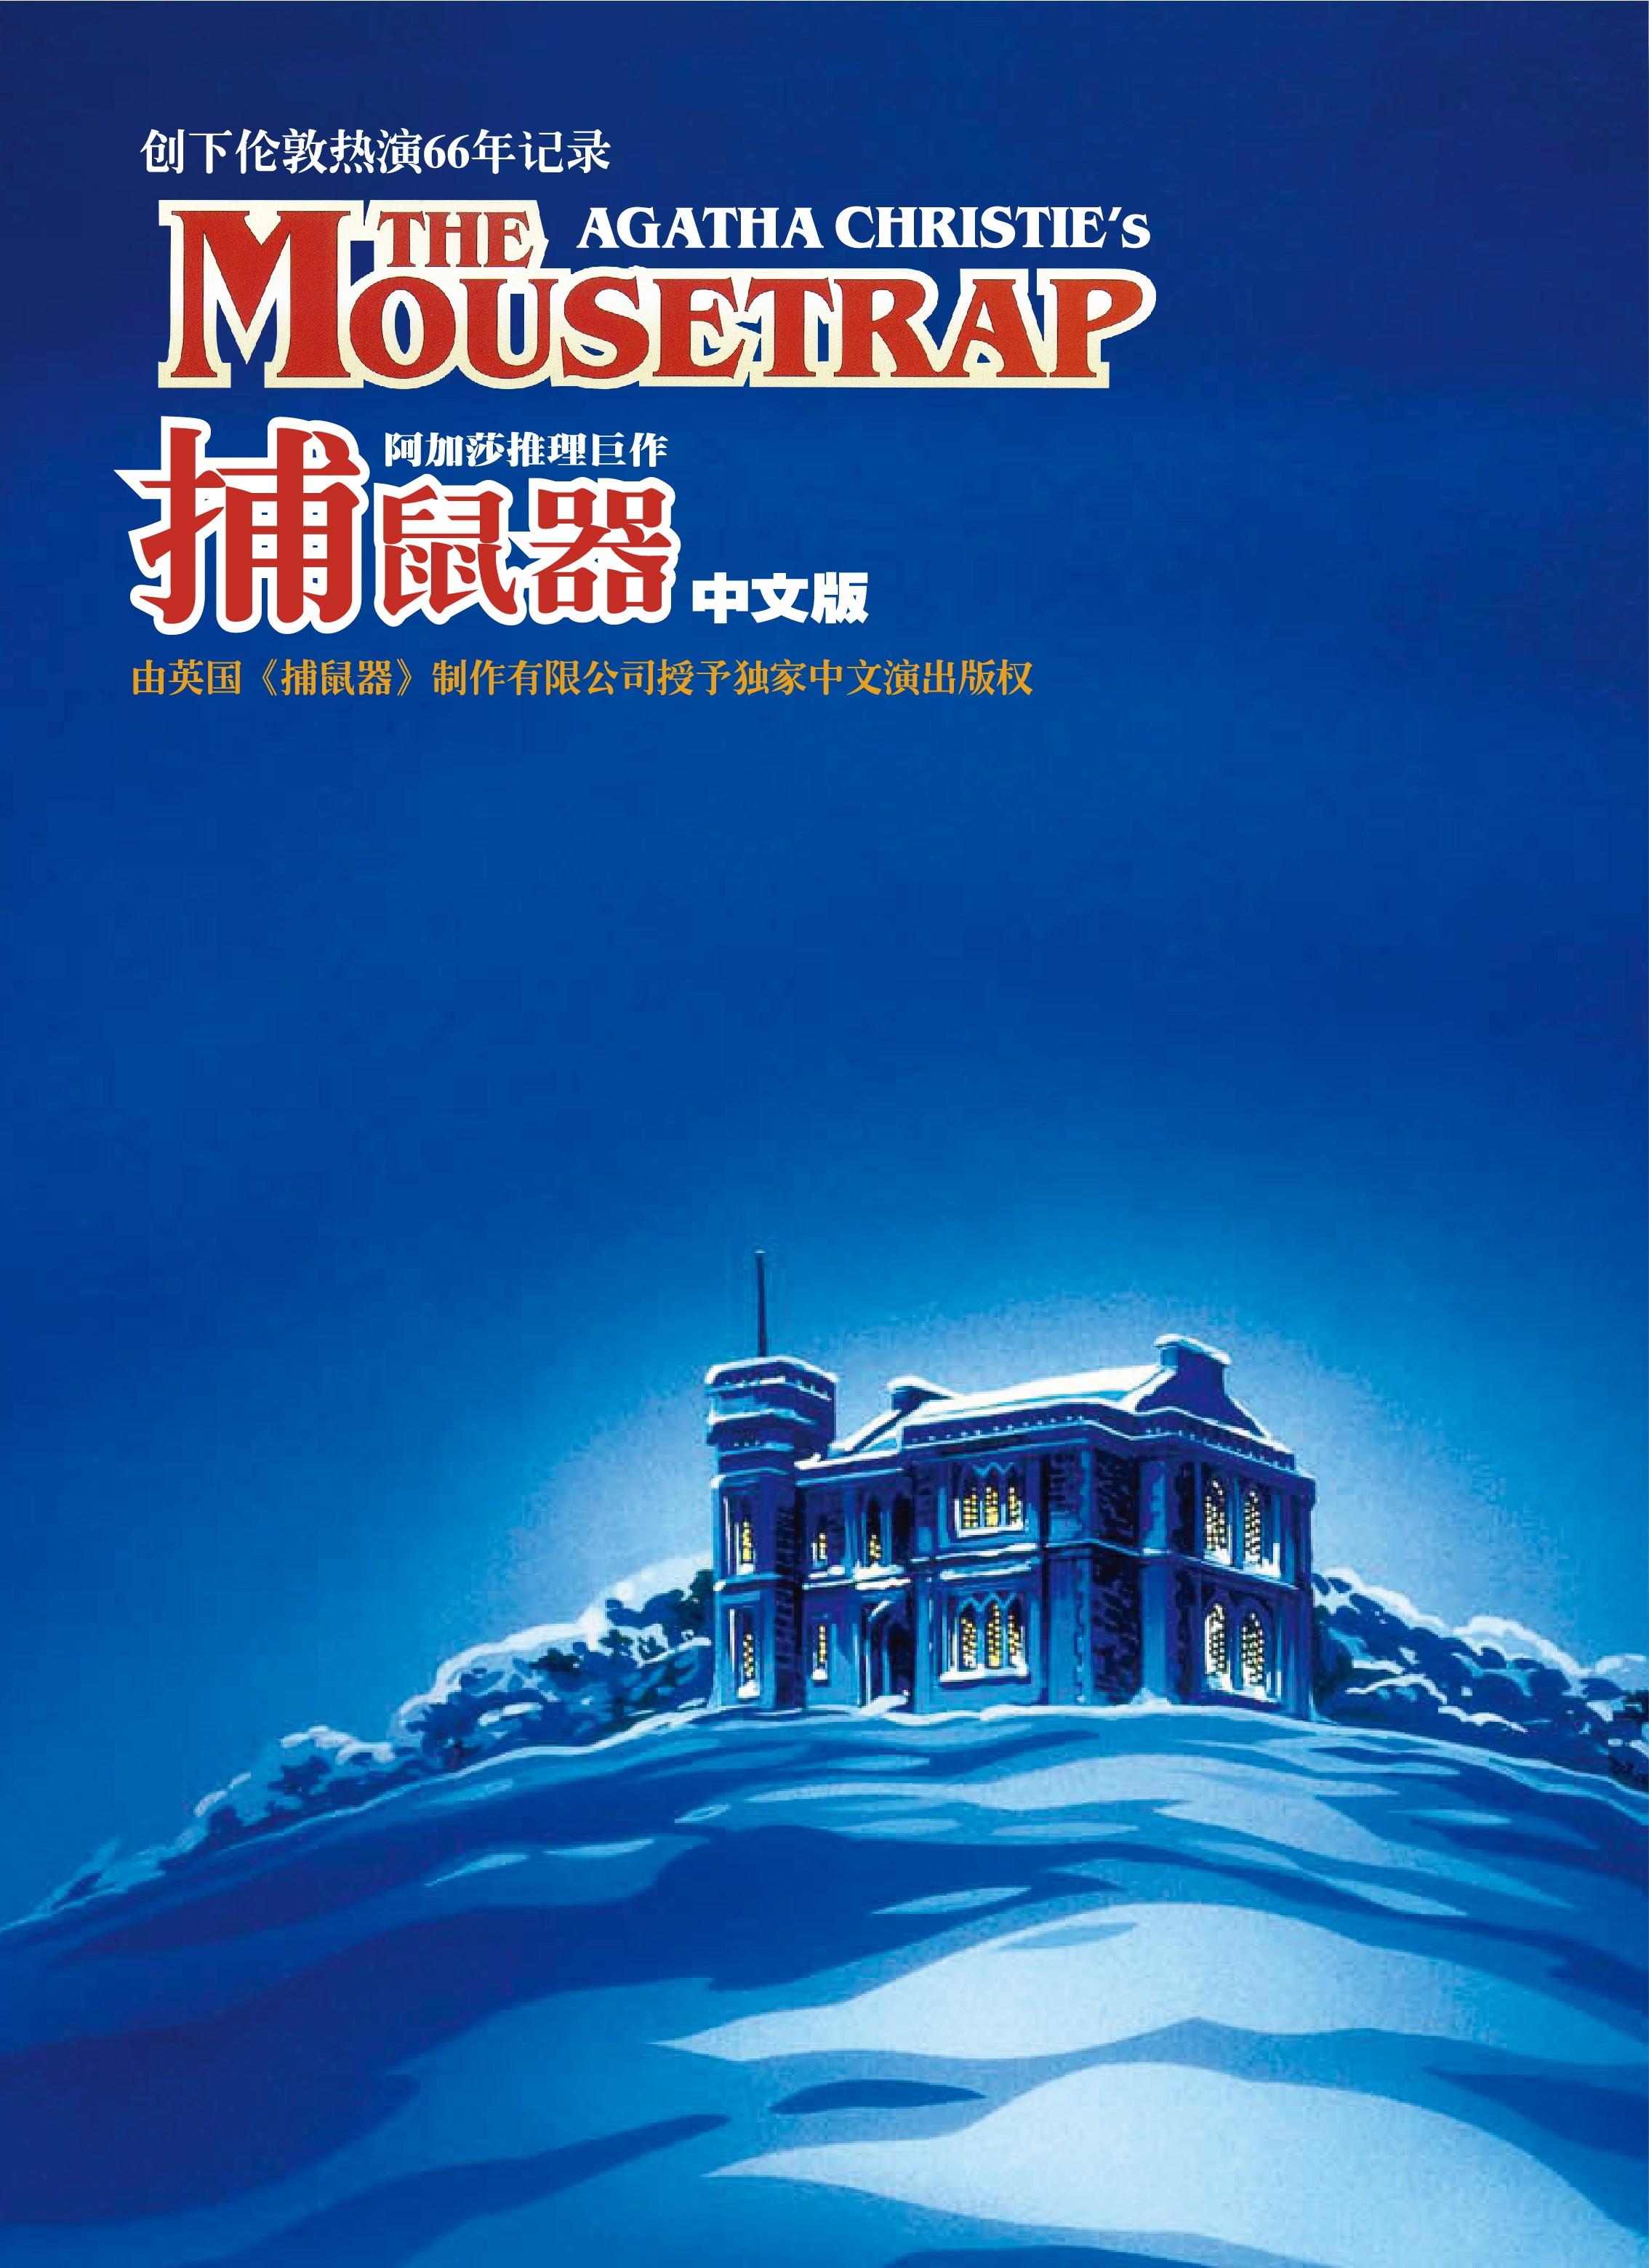 Mailive阿加莎推理巨作《捕鼠器》2019经典中文版